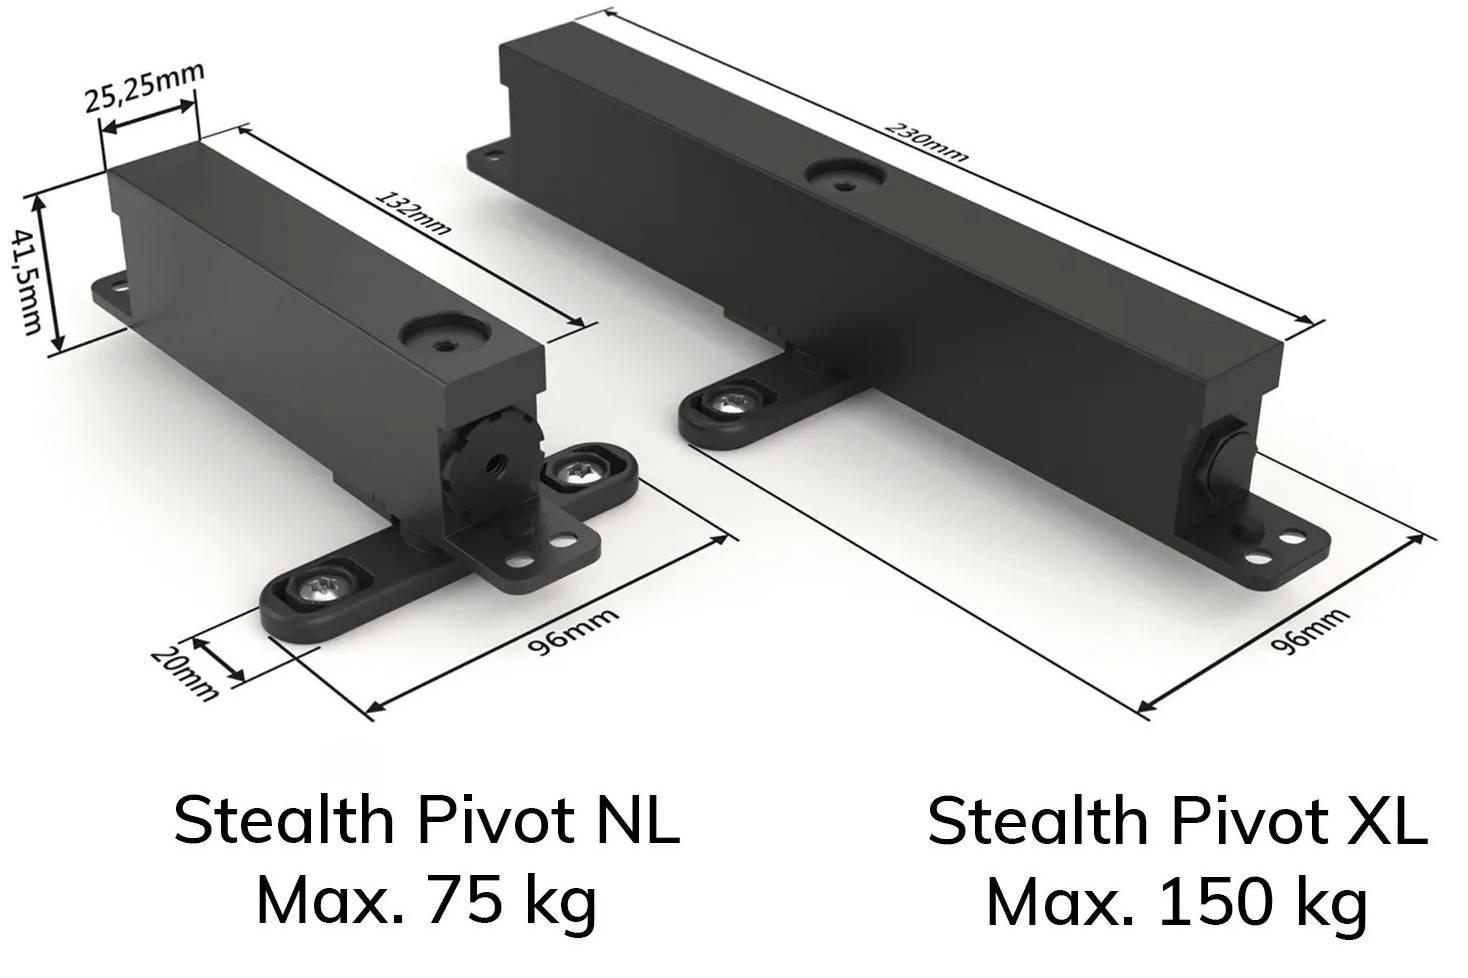 Stealth Pivot pivot hinge systems